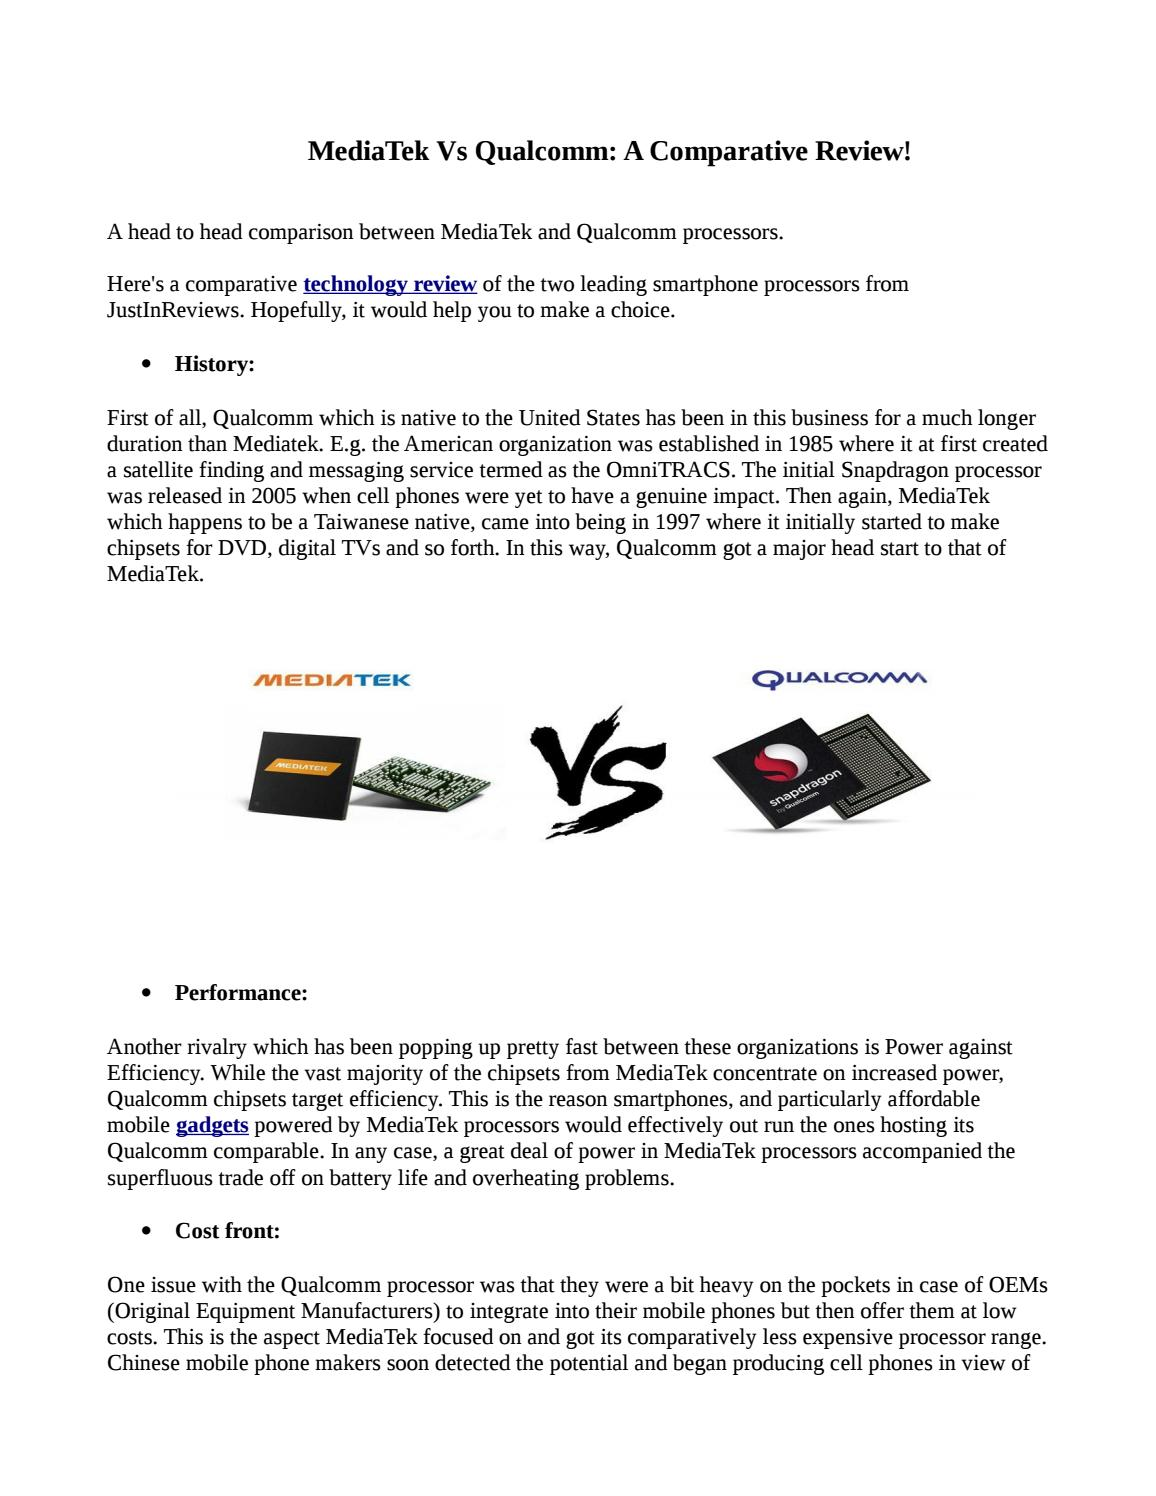 Mediatek vs qualcomm a comparative review by sonali456 - issuu